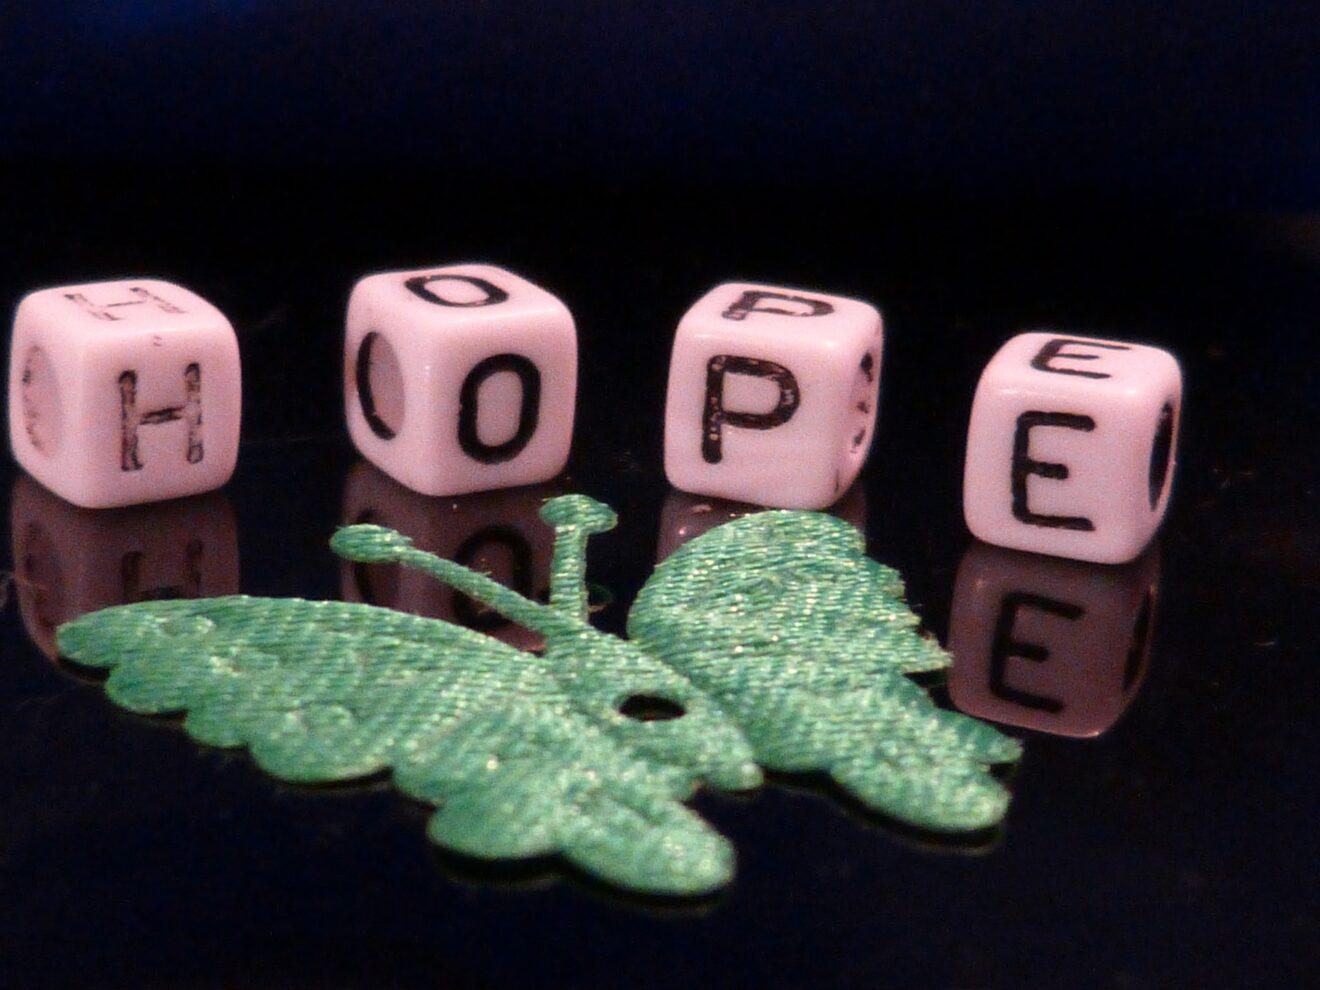 hope-718703_1920